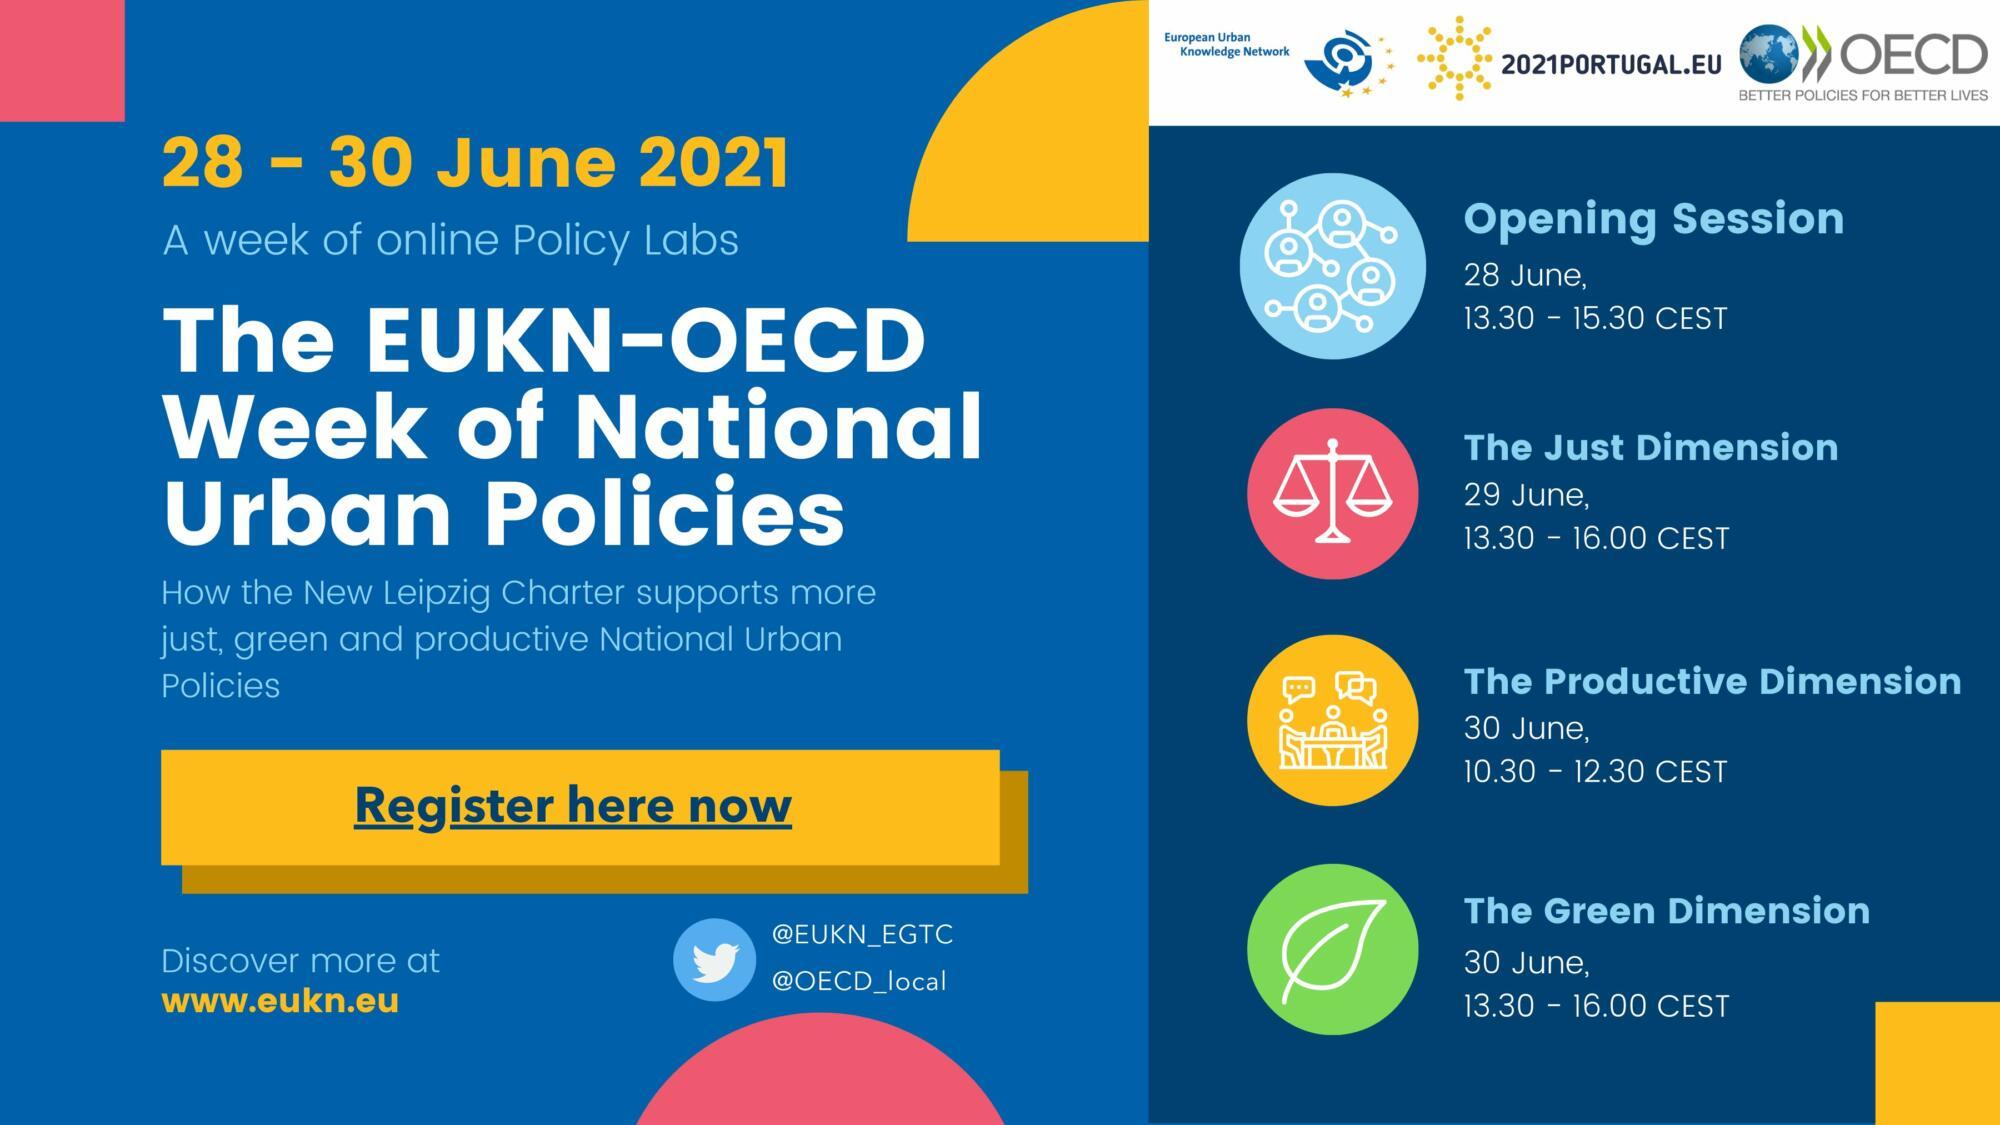 Join the EUKN-OECD Week of National Urban Policies (NUPs)